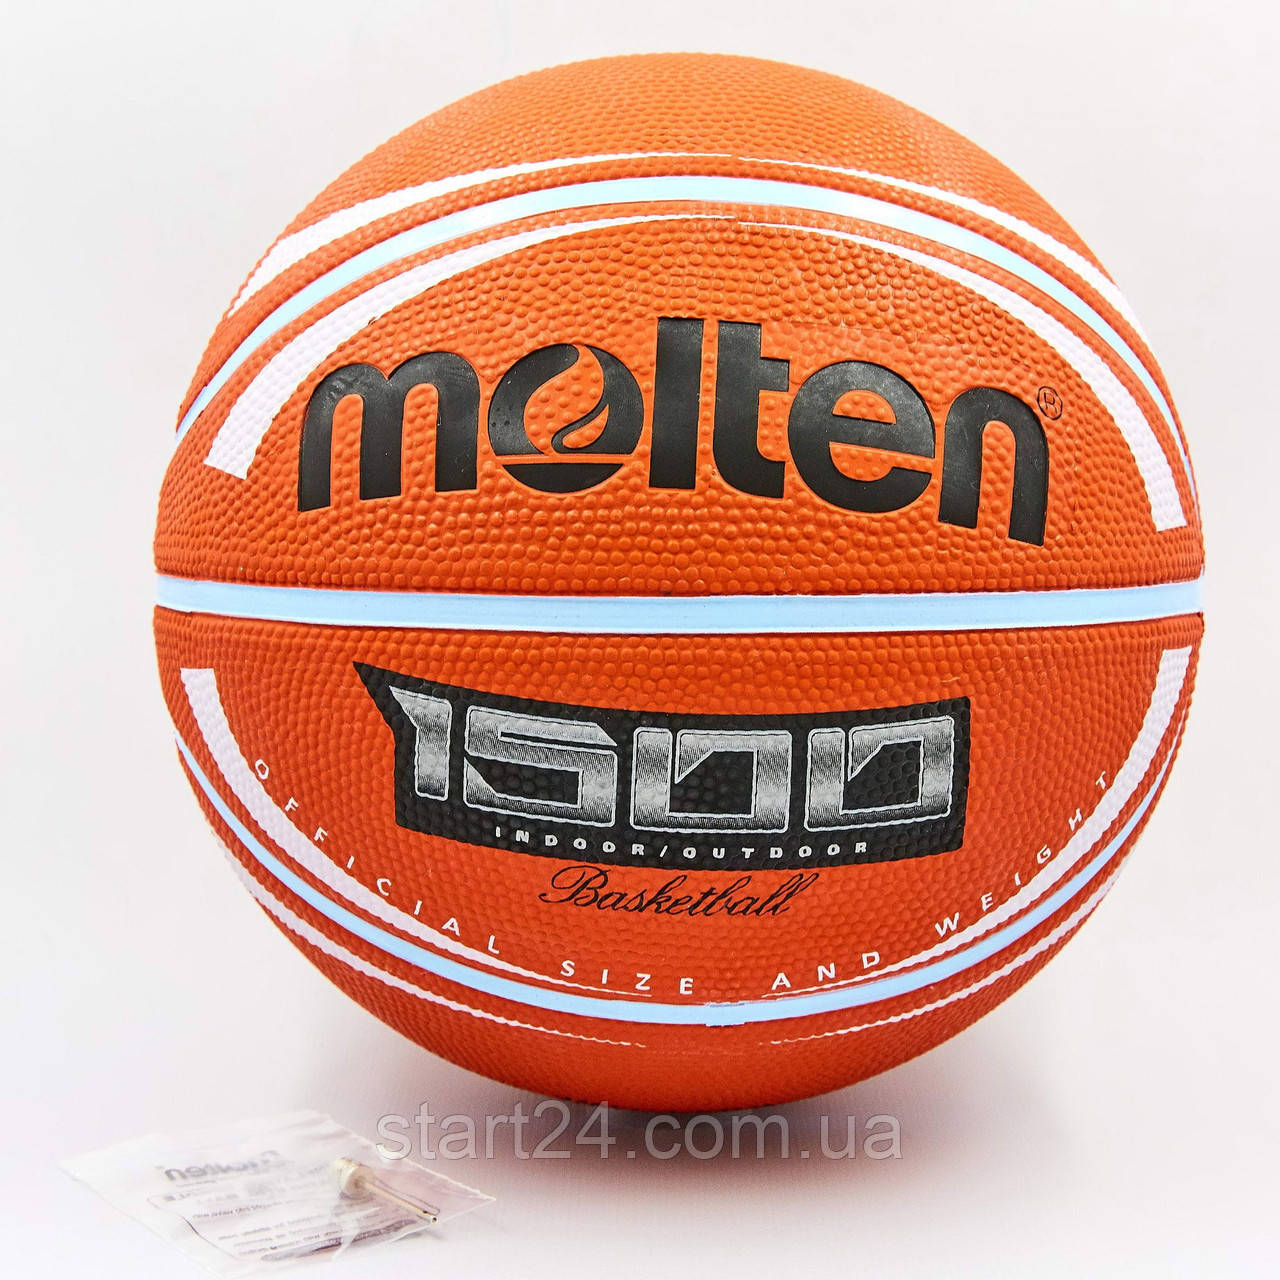 М'яч баскетбольний гумовий №7 MOLTEN B7RD-1500BRW (гума, бутил, оранжевий)